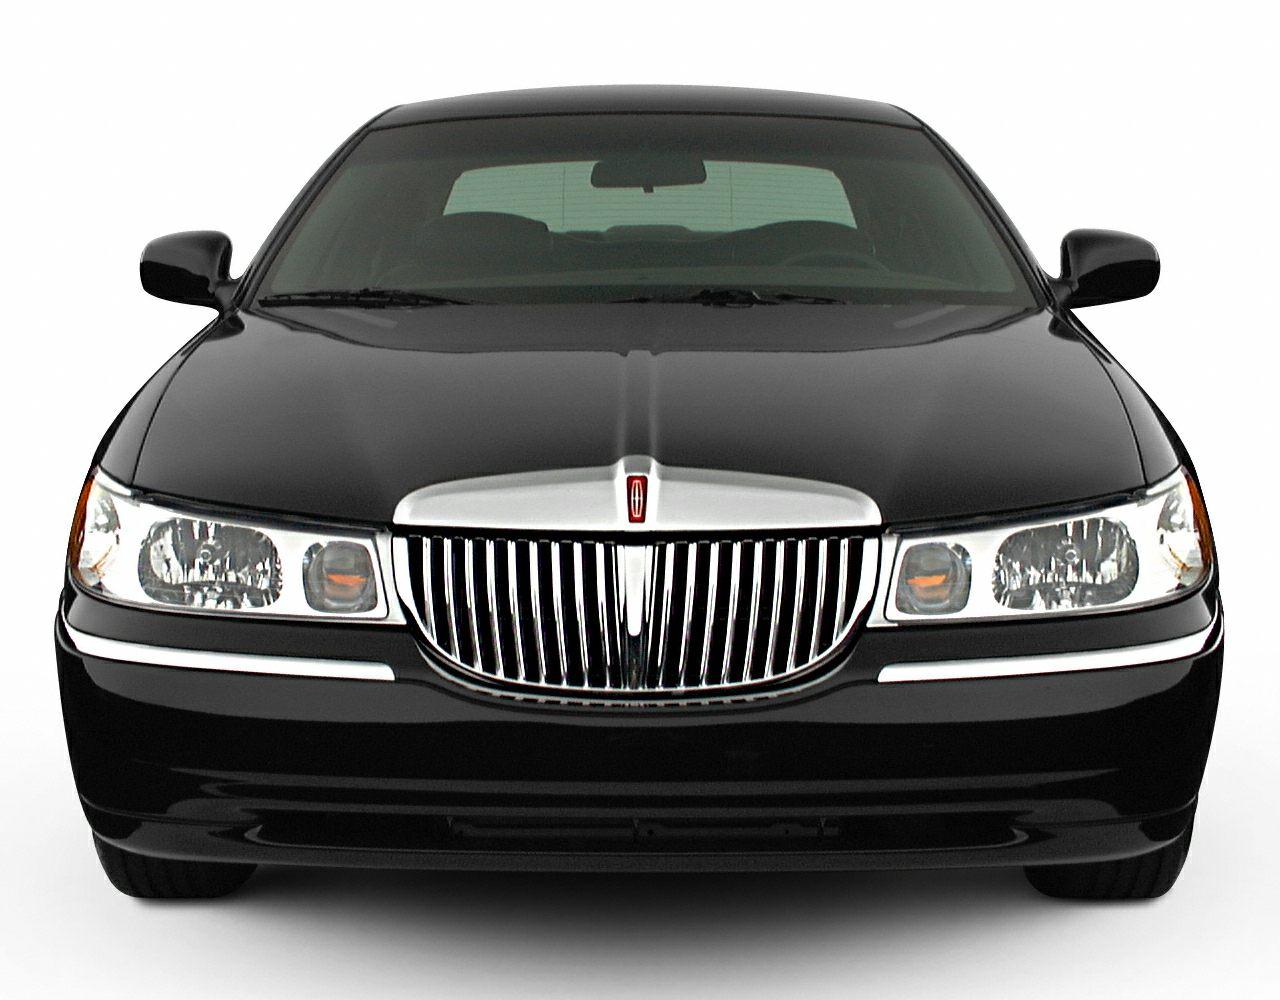 2000 lincoln town car executive 4dr sedan pictures. Black Bedroom Furniture Sets. Home Design Ideas